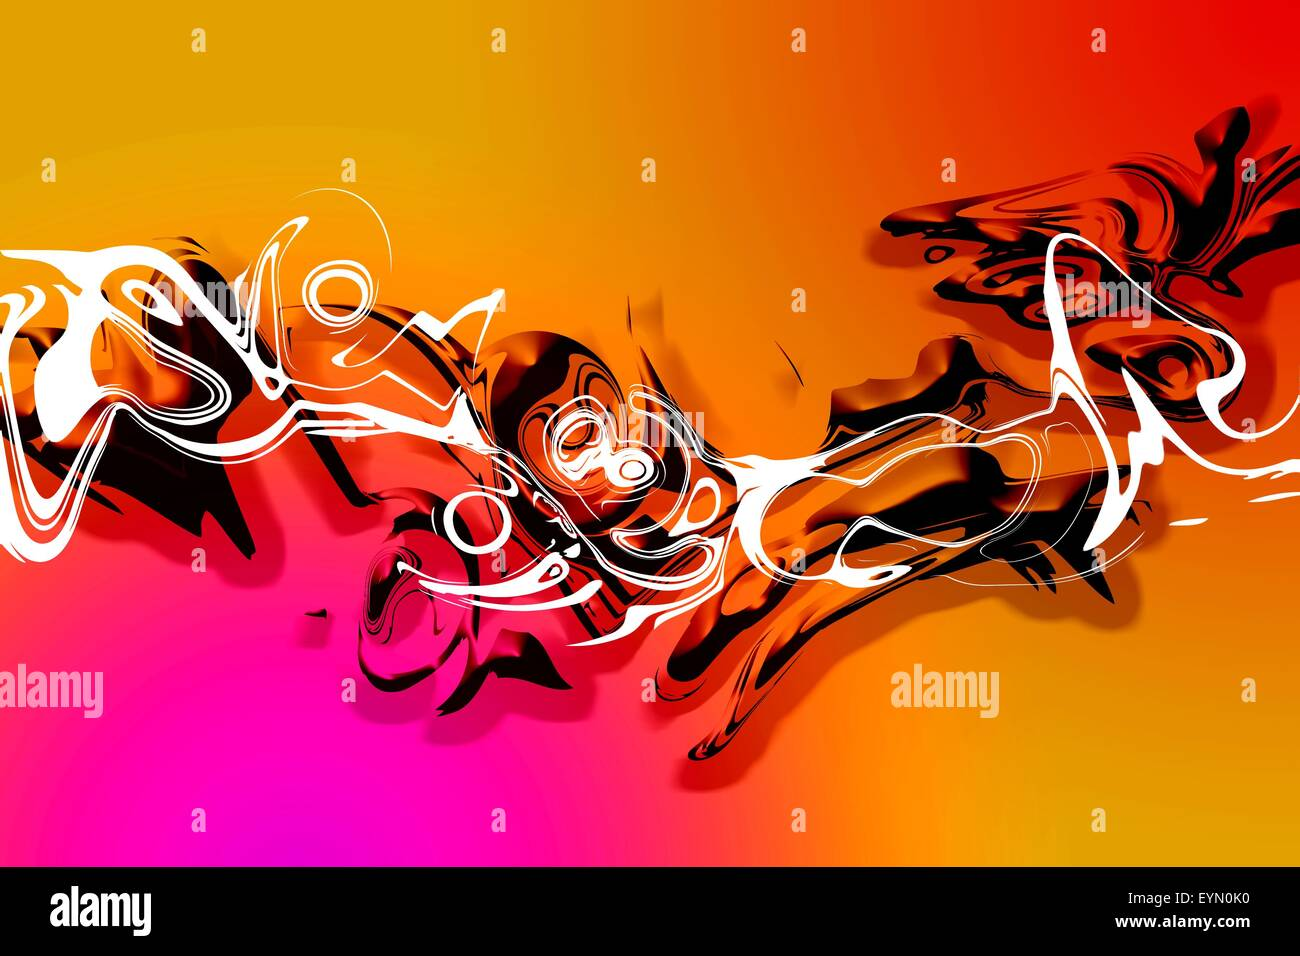 Color Design Art : Abstraction color design art stock photo  alamy